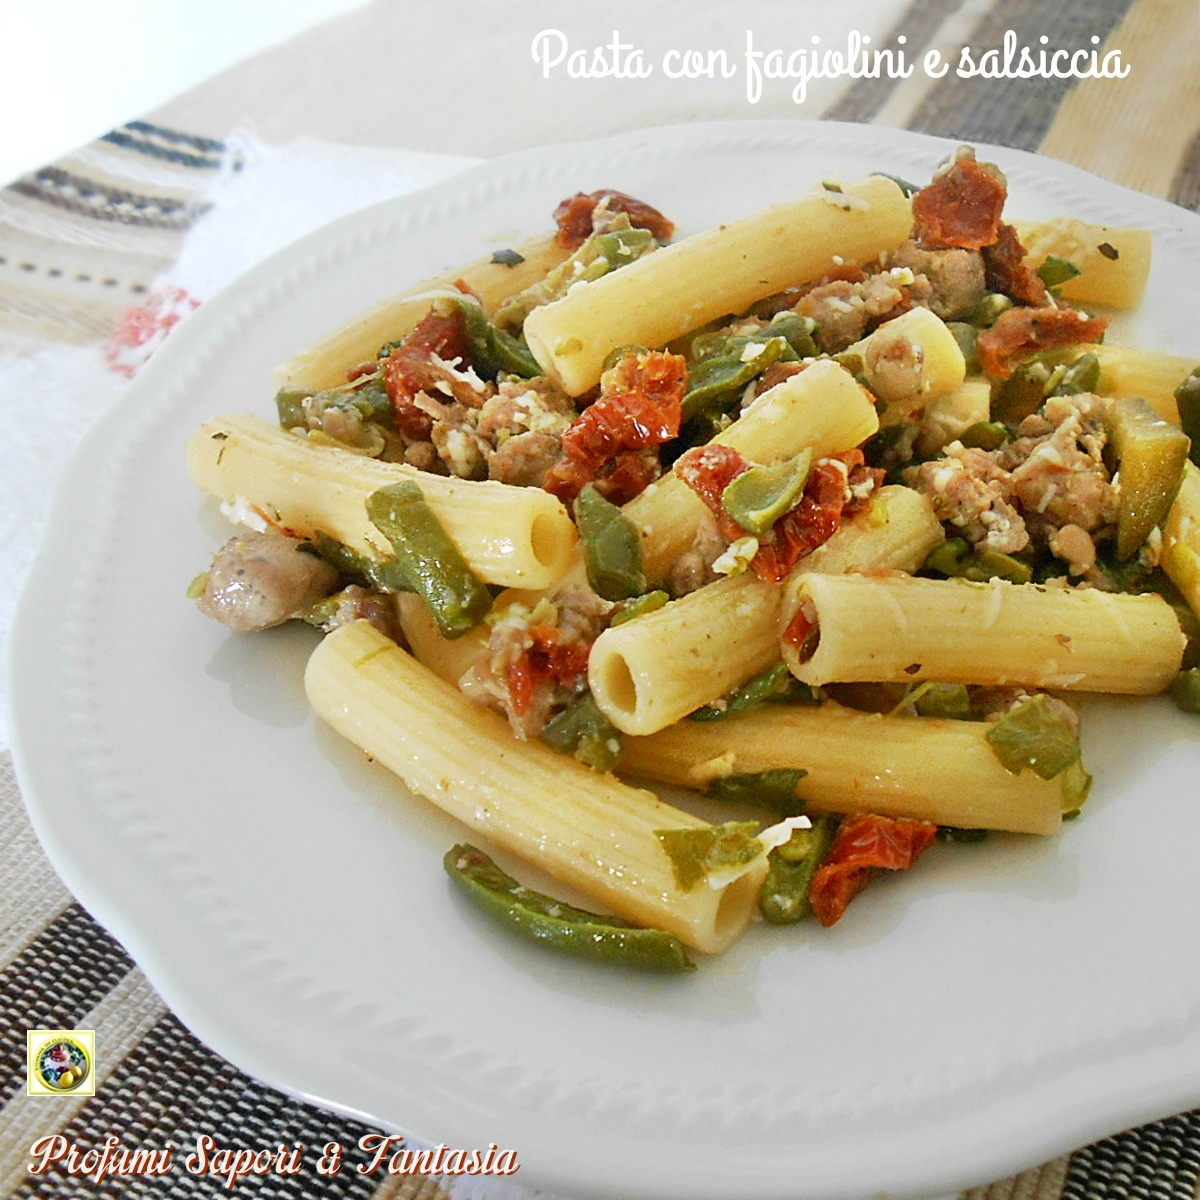 Pasta con fagiolini e salsiccia Blog Profumi Sapori & Fantasia